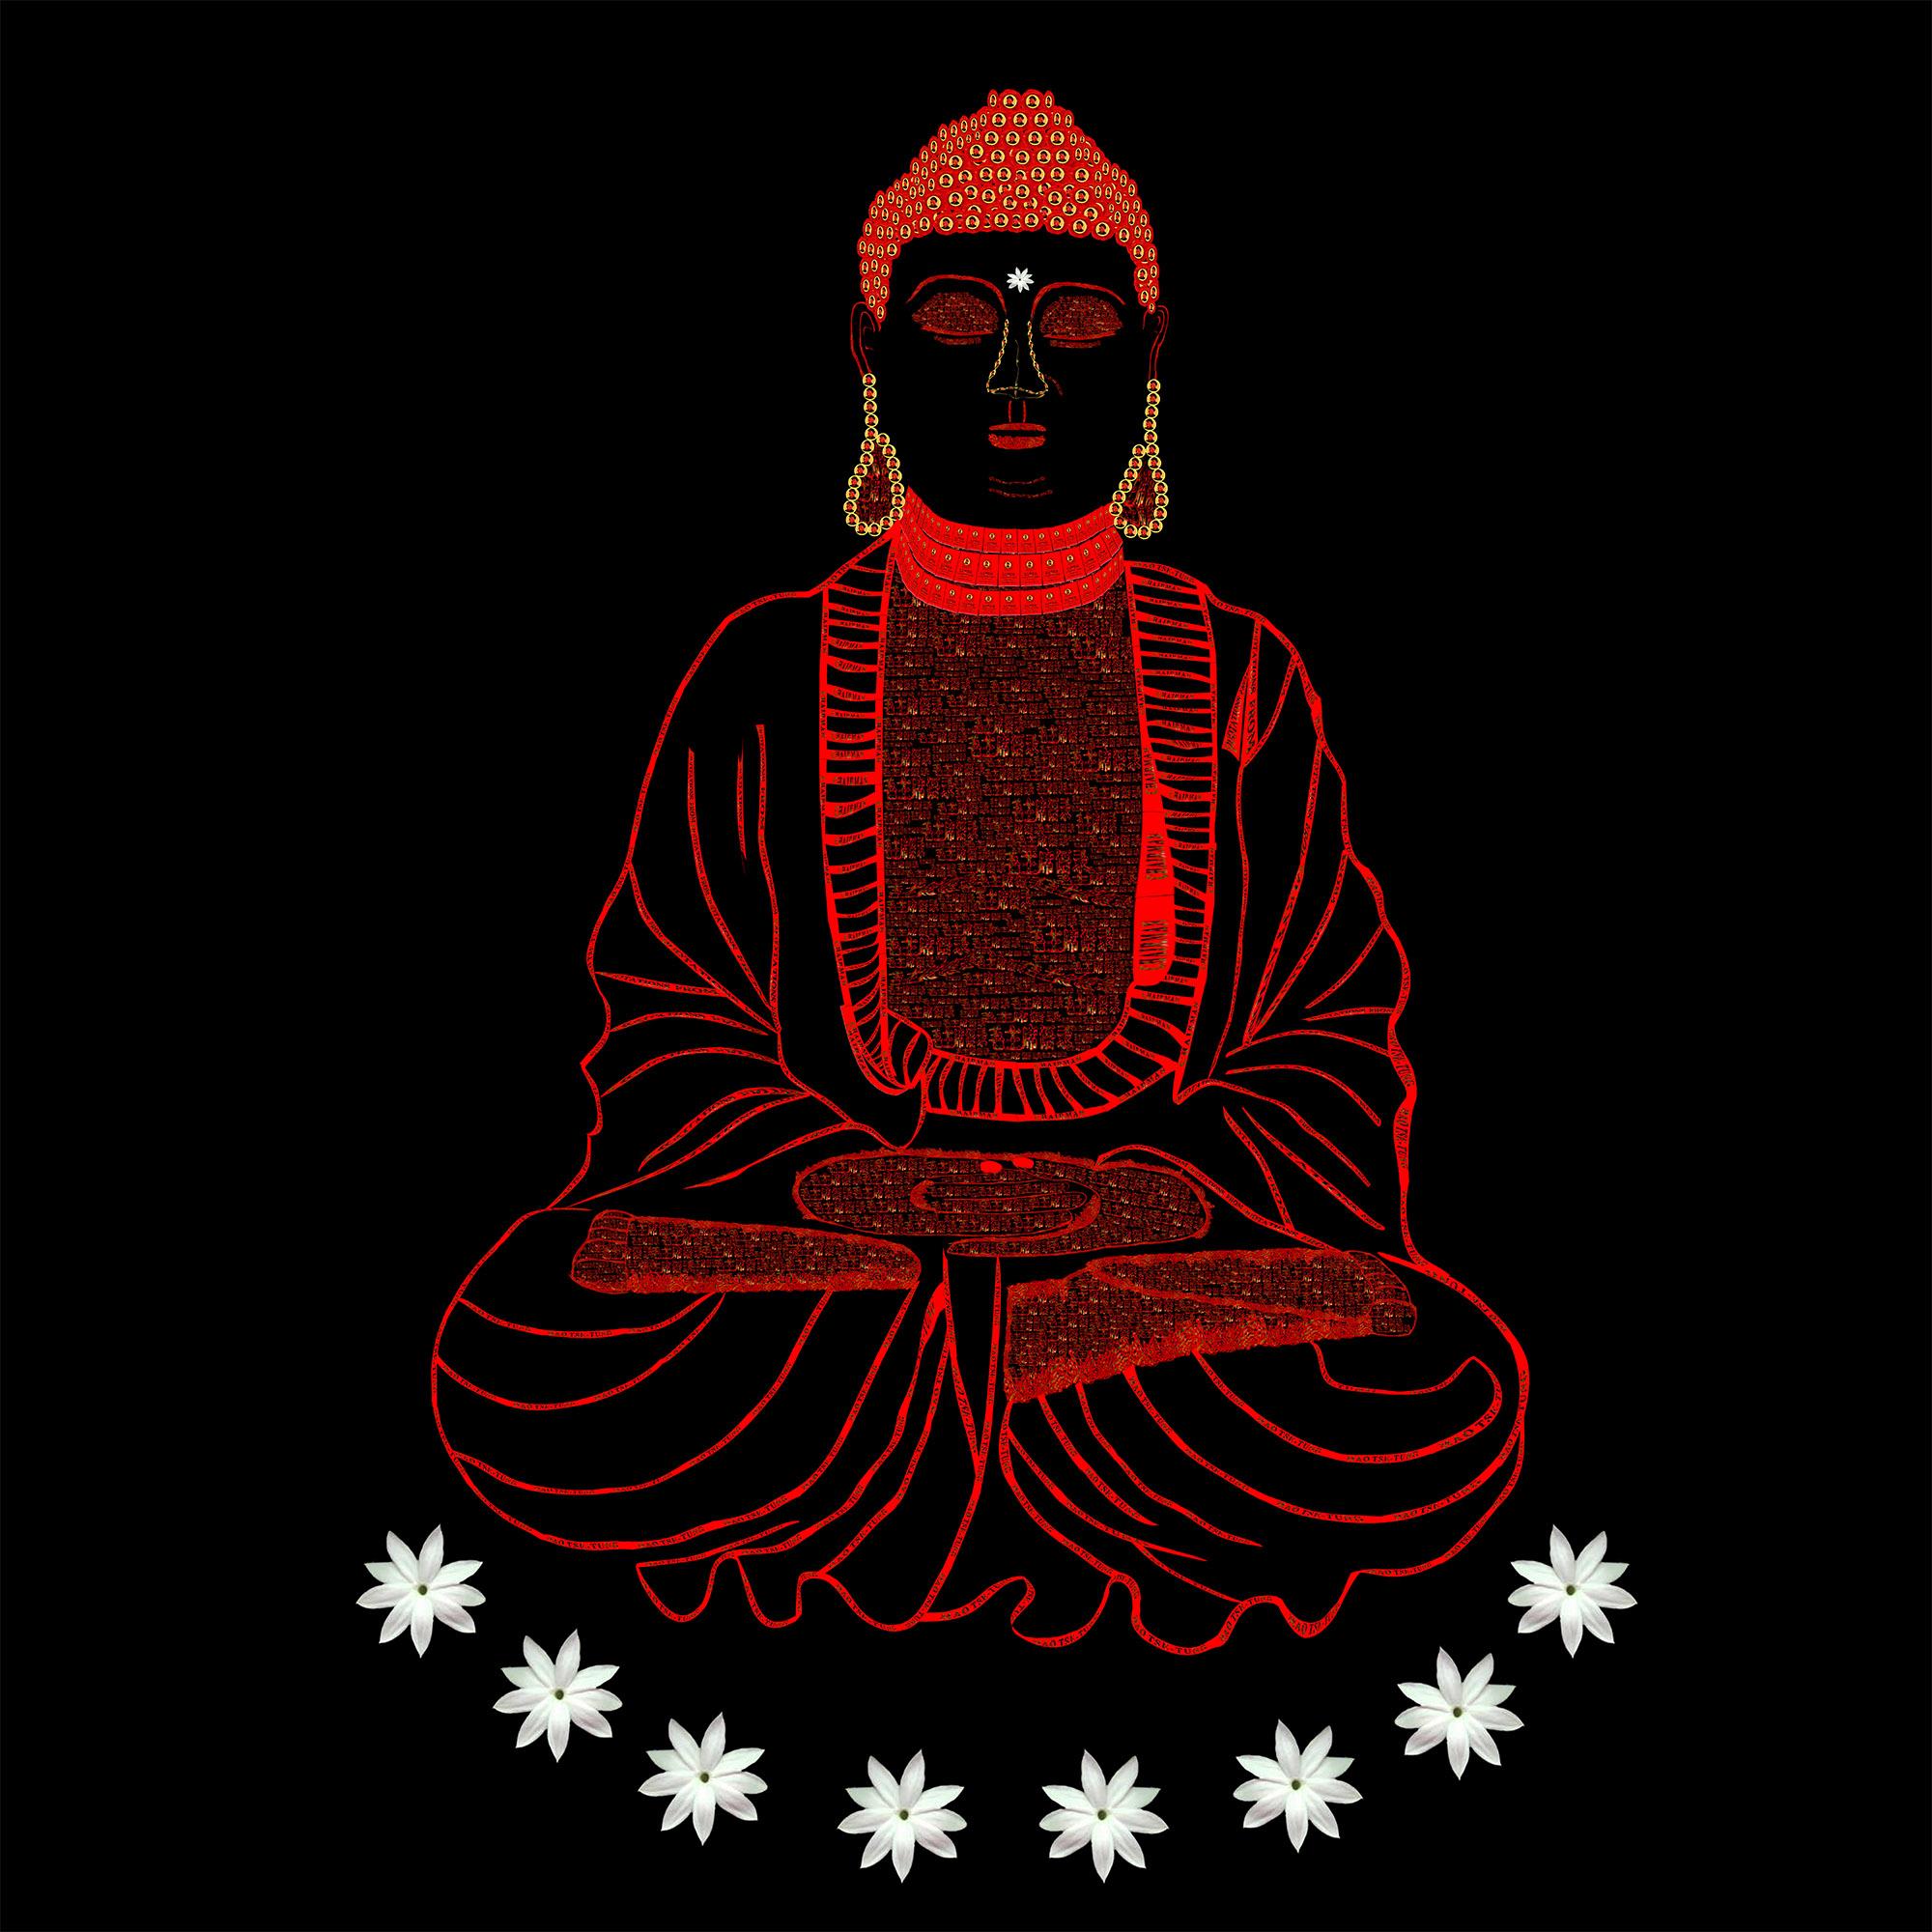 Red Book Buddha - Black